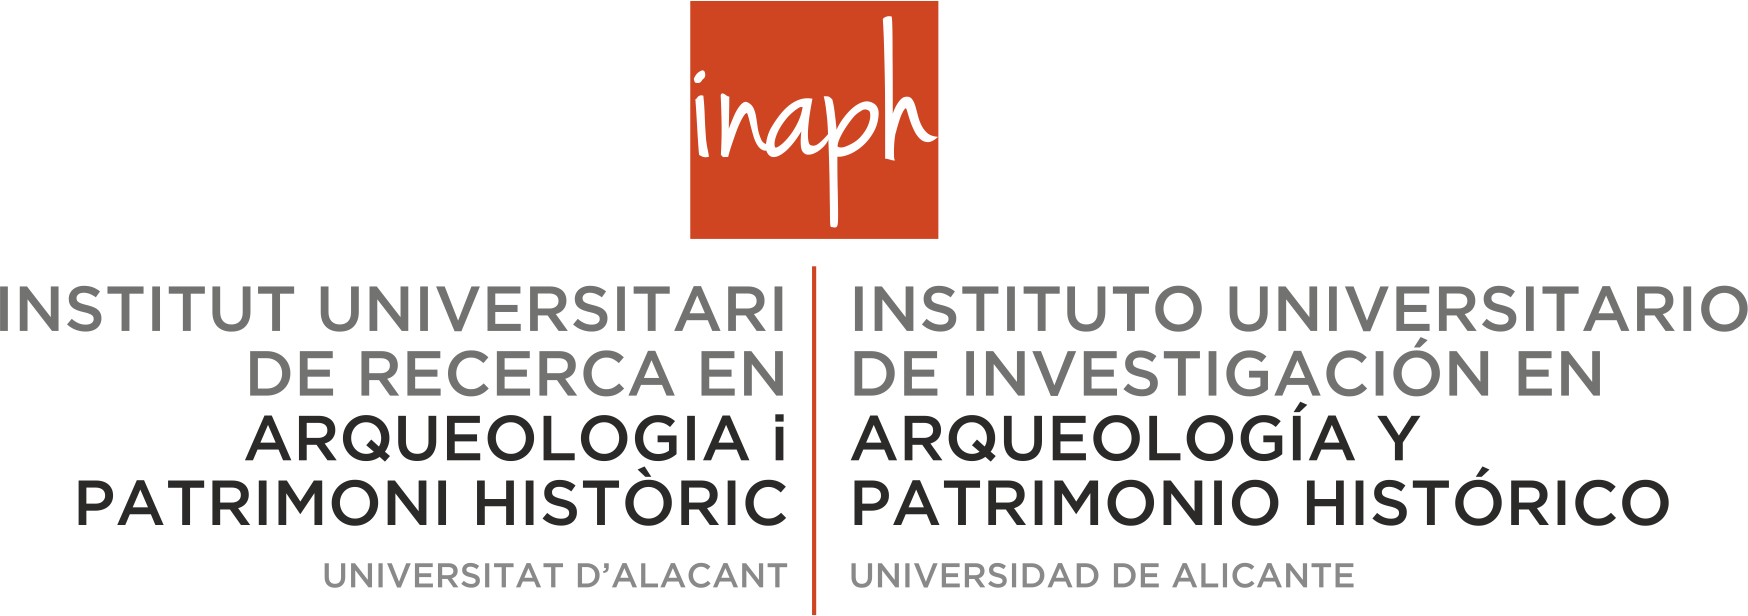 Logotipo INAPH